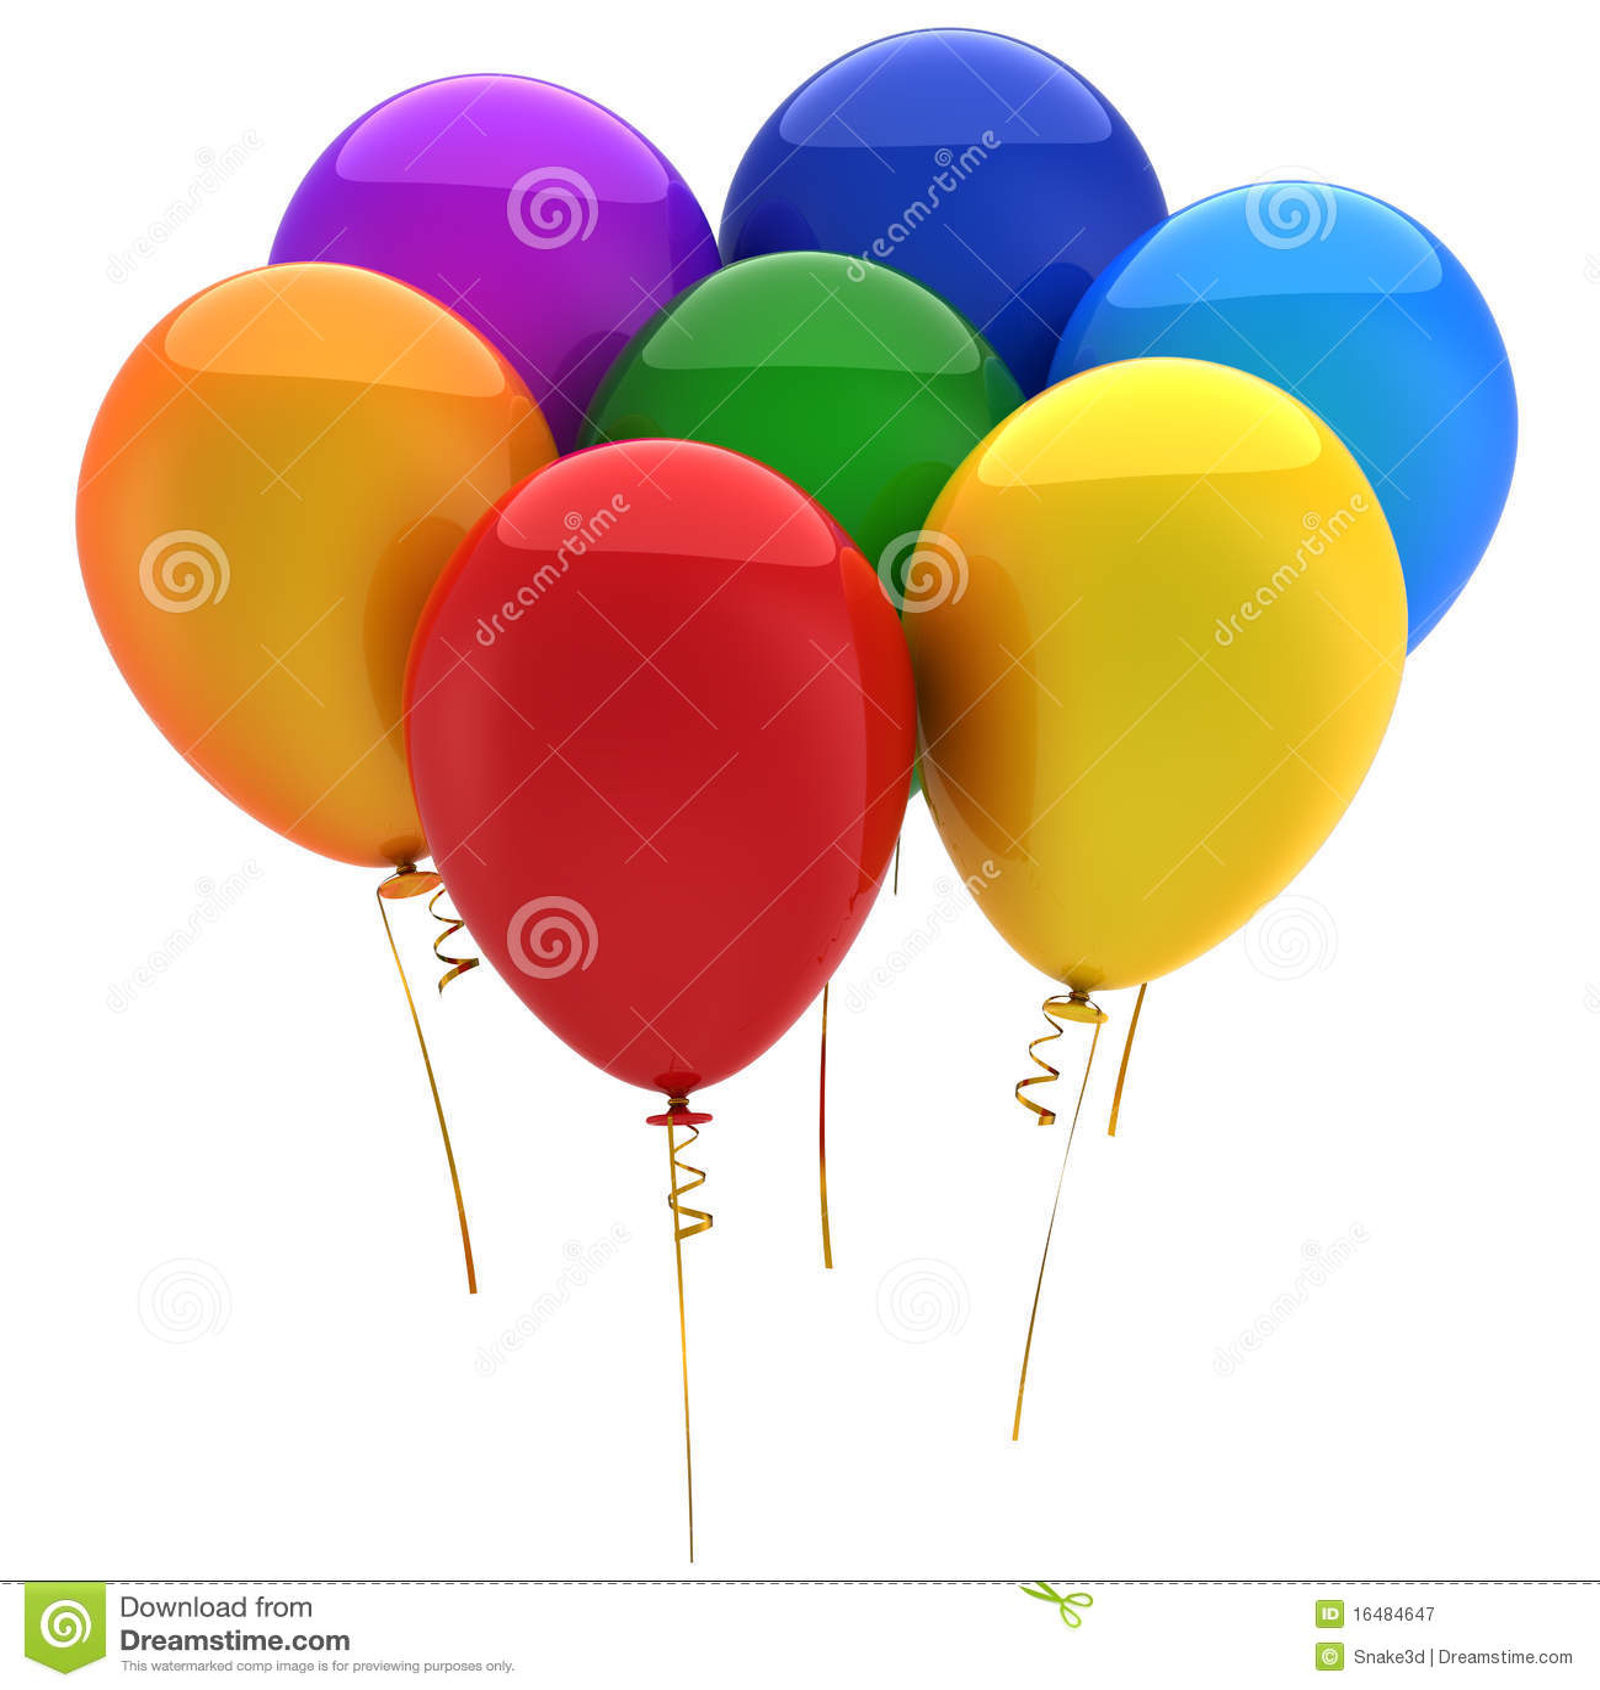 Green and blue balloons - Blue Cyan Green